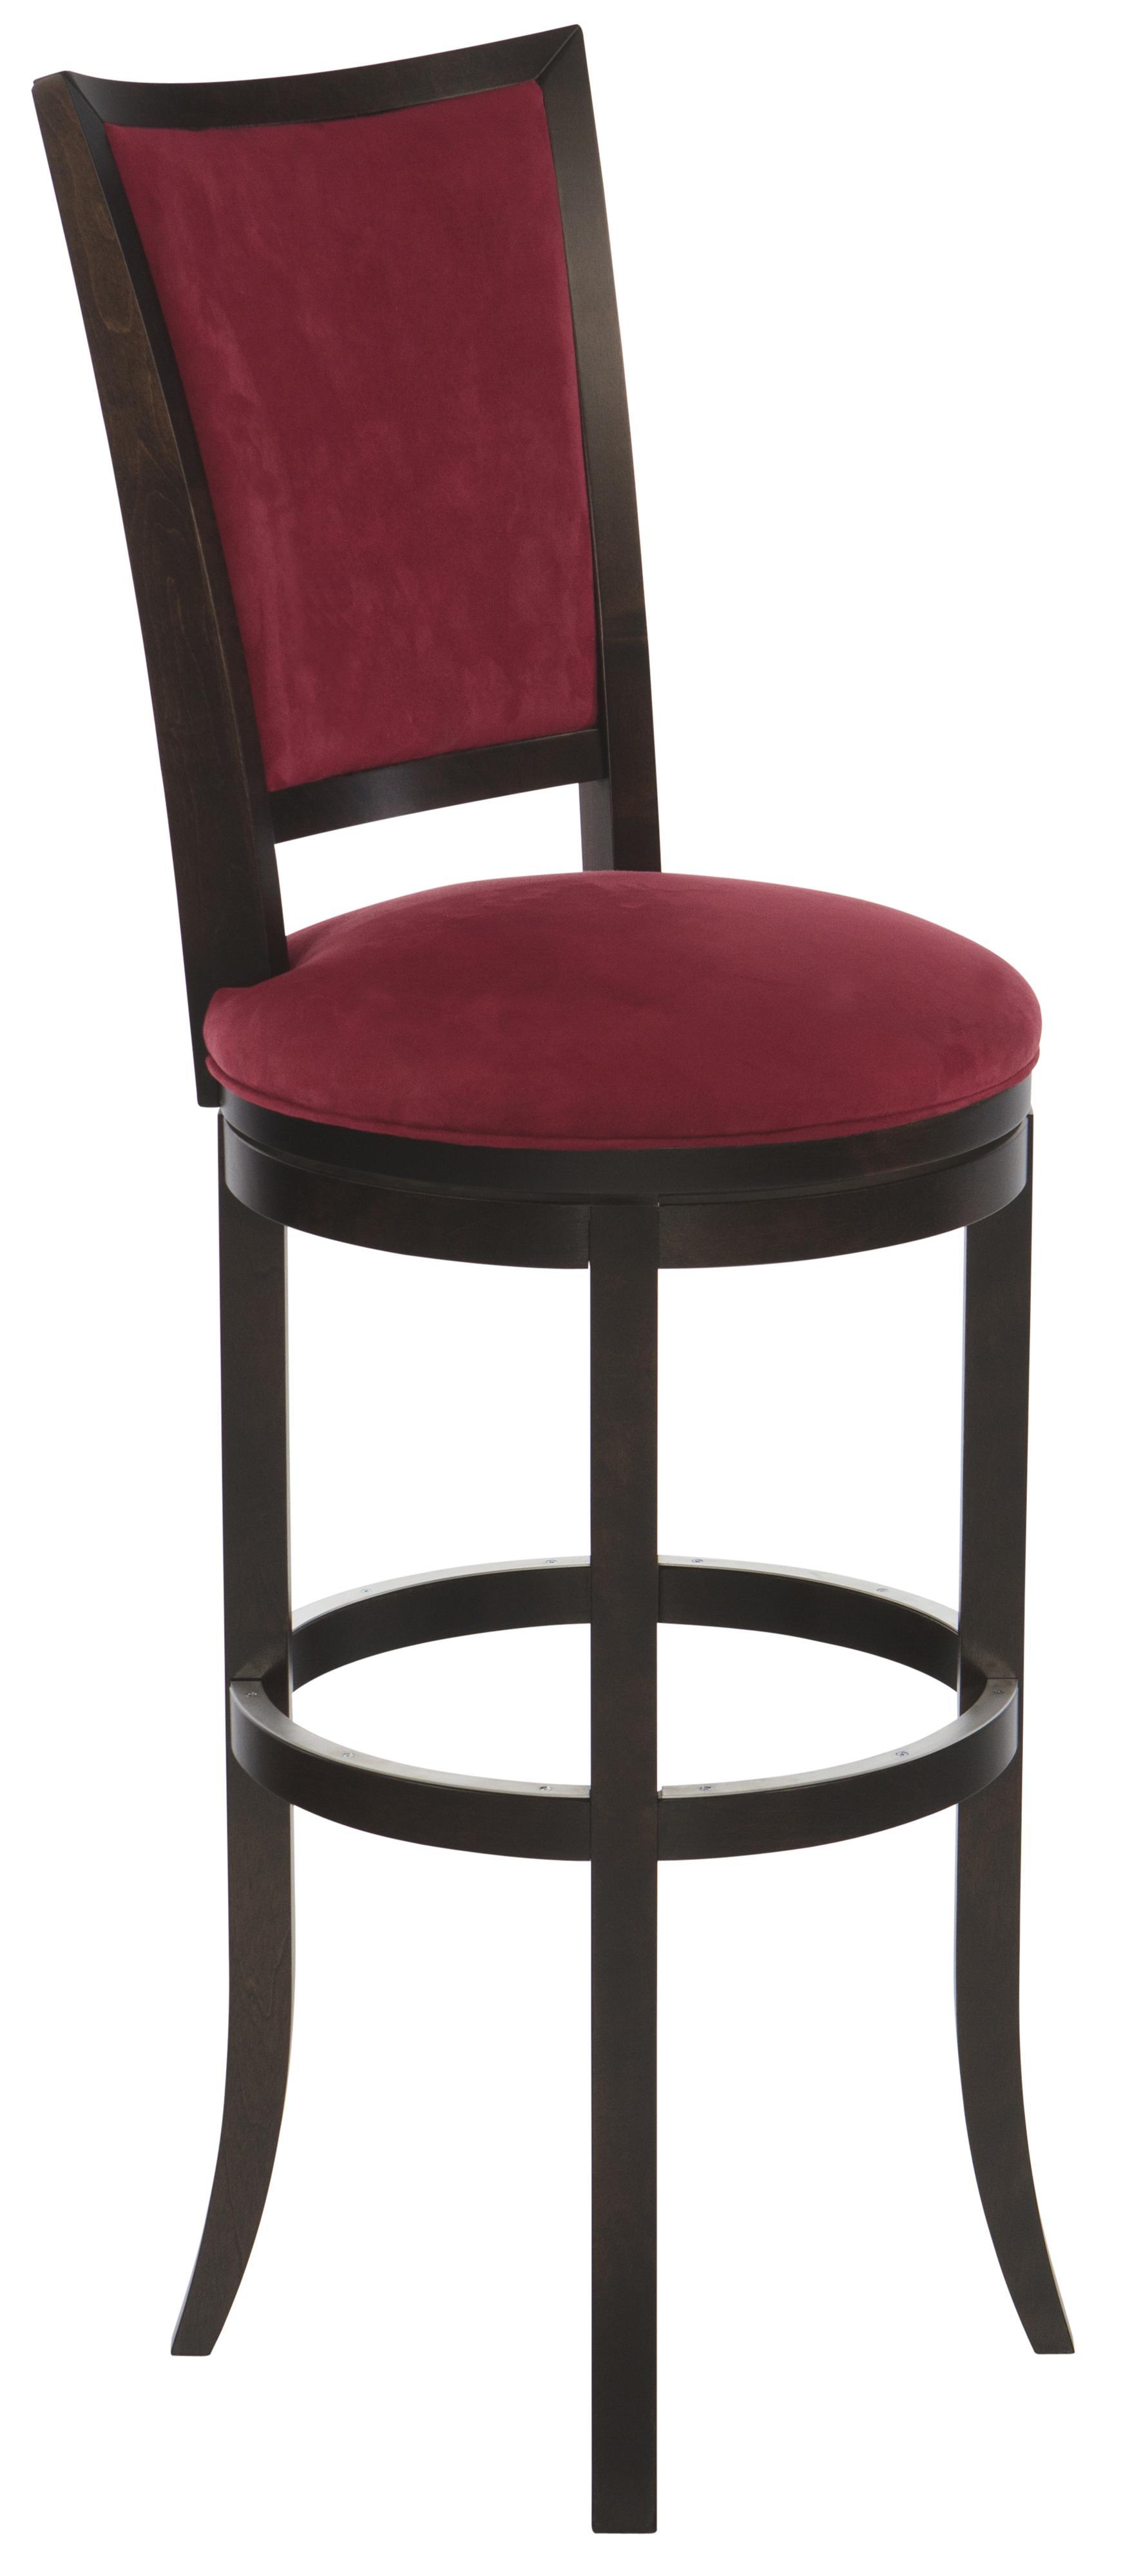 Canadel Bar Stools Customizable 34 Upholstered Swivel